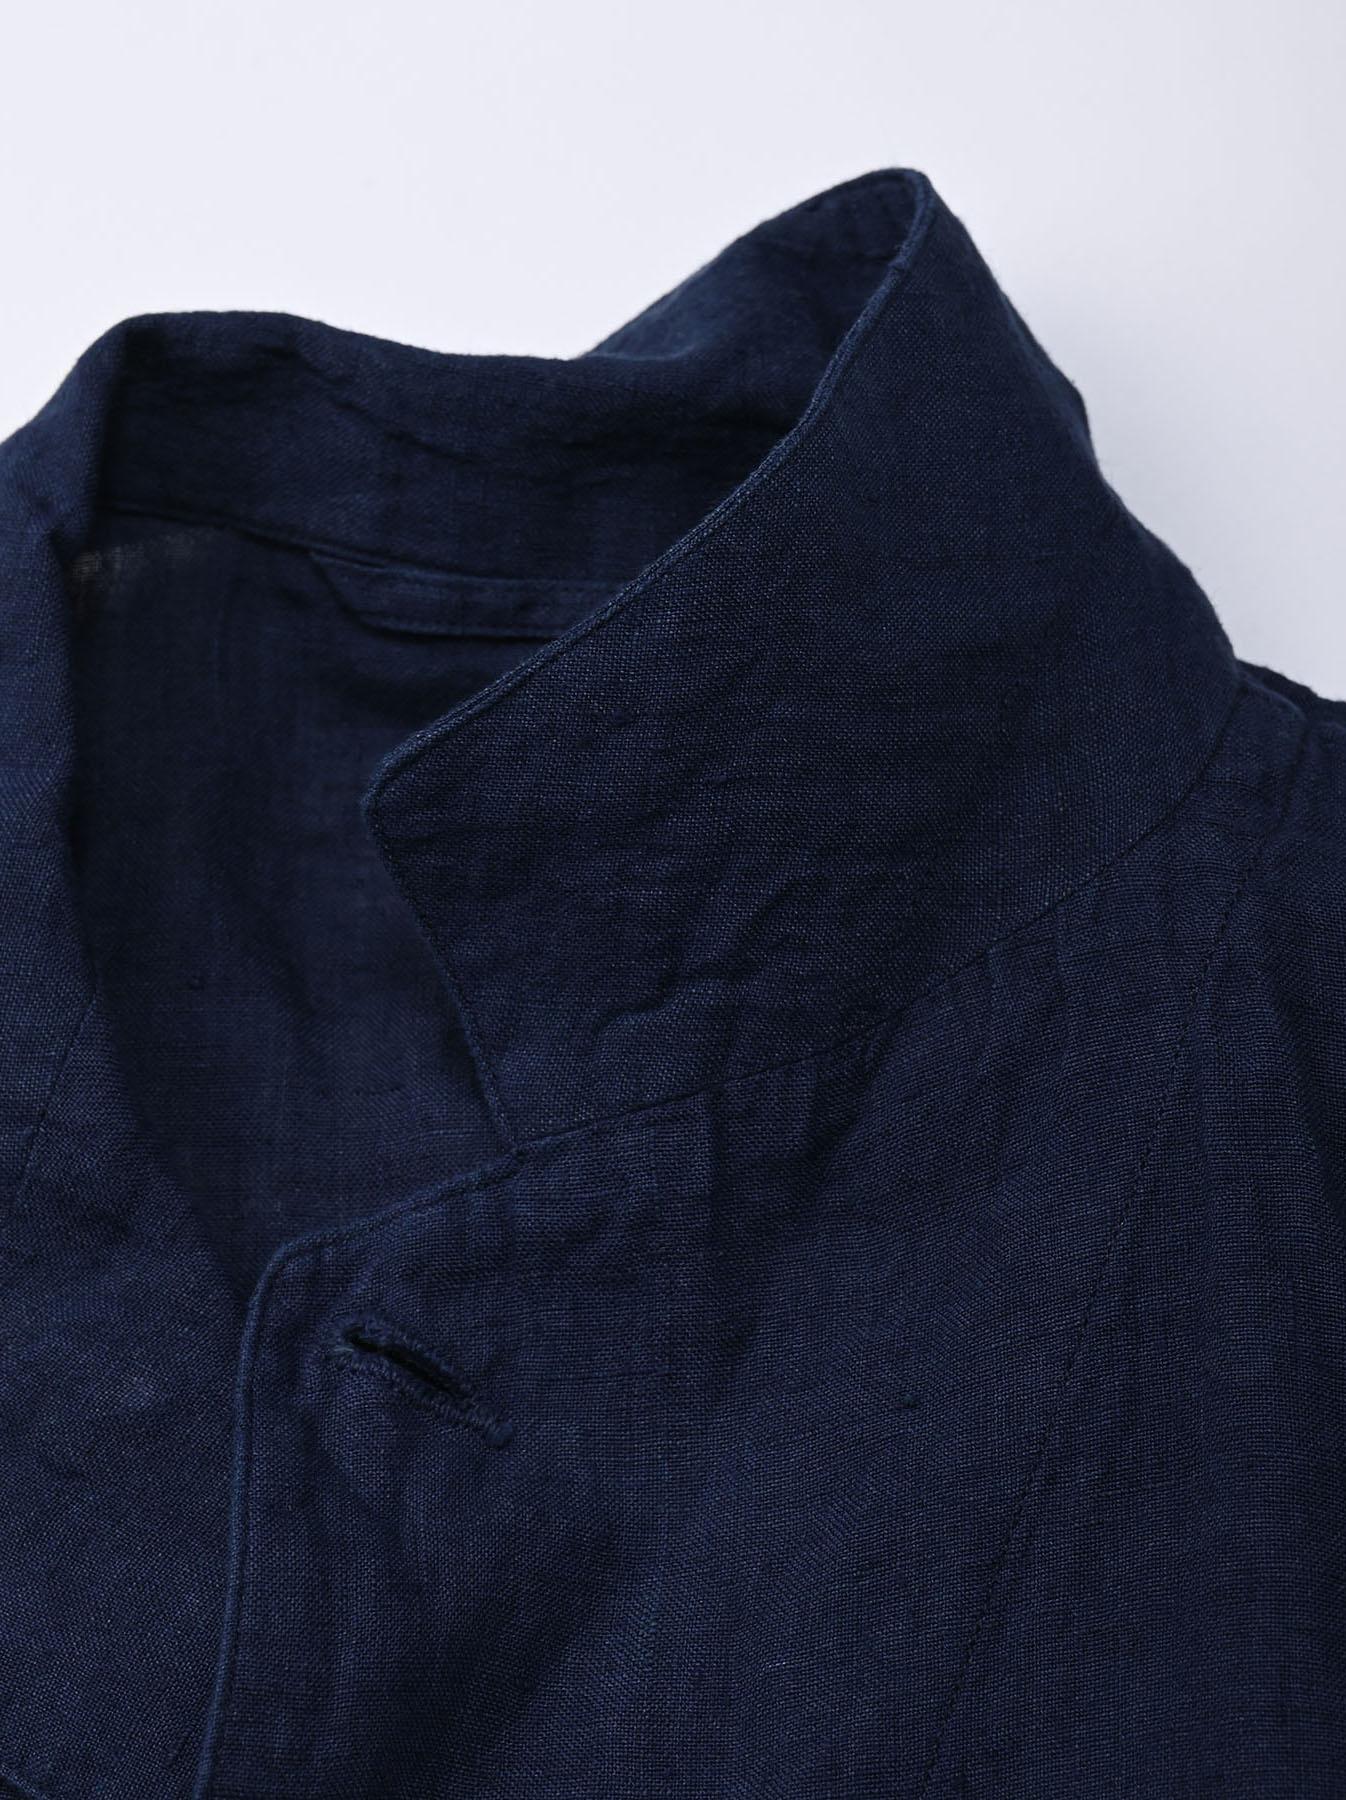 Indigo Indian Linen Flat Shirt Jacket (0521)-8